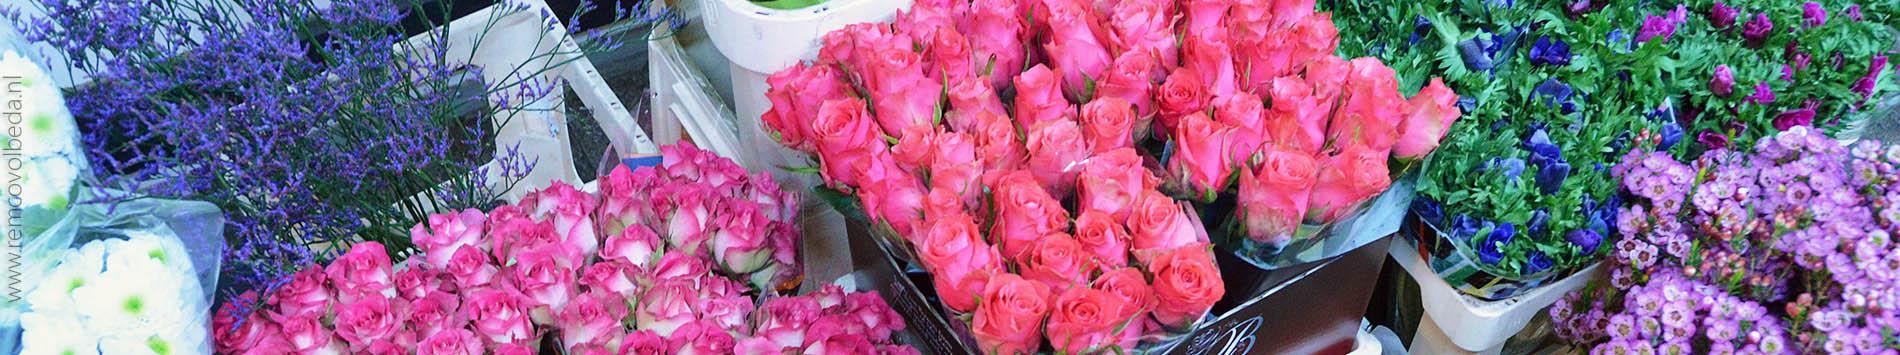 images/slider/slider-volbeda-bloemen.jpg